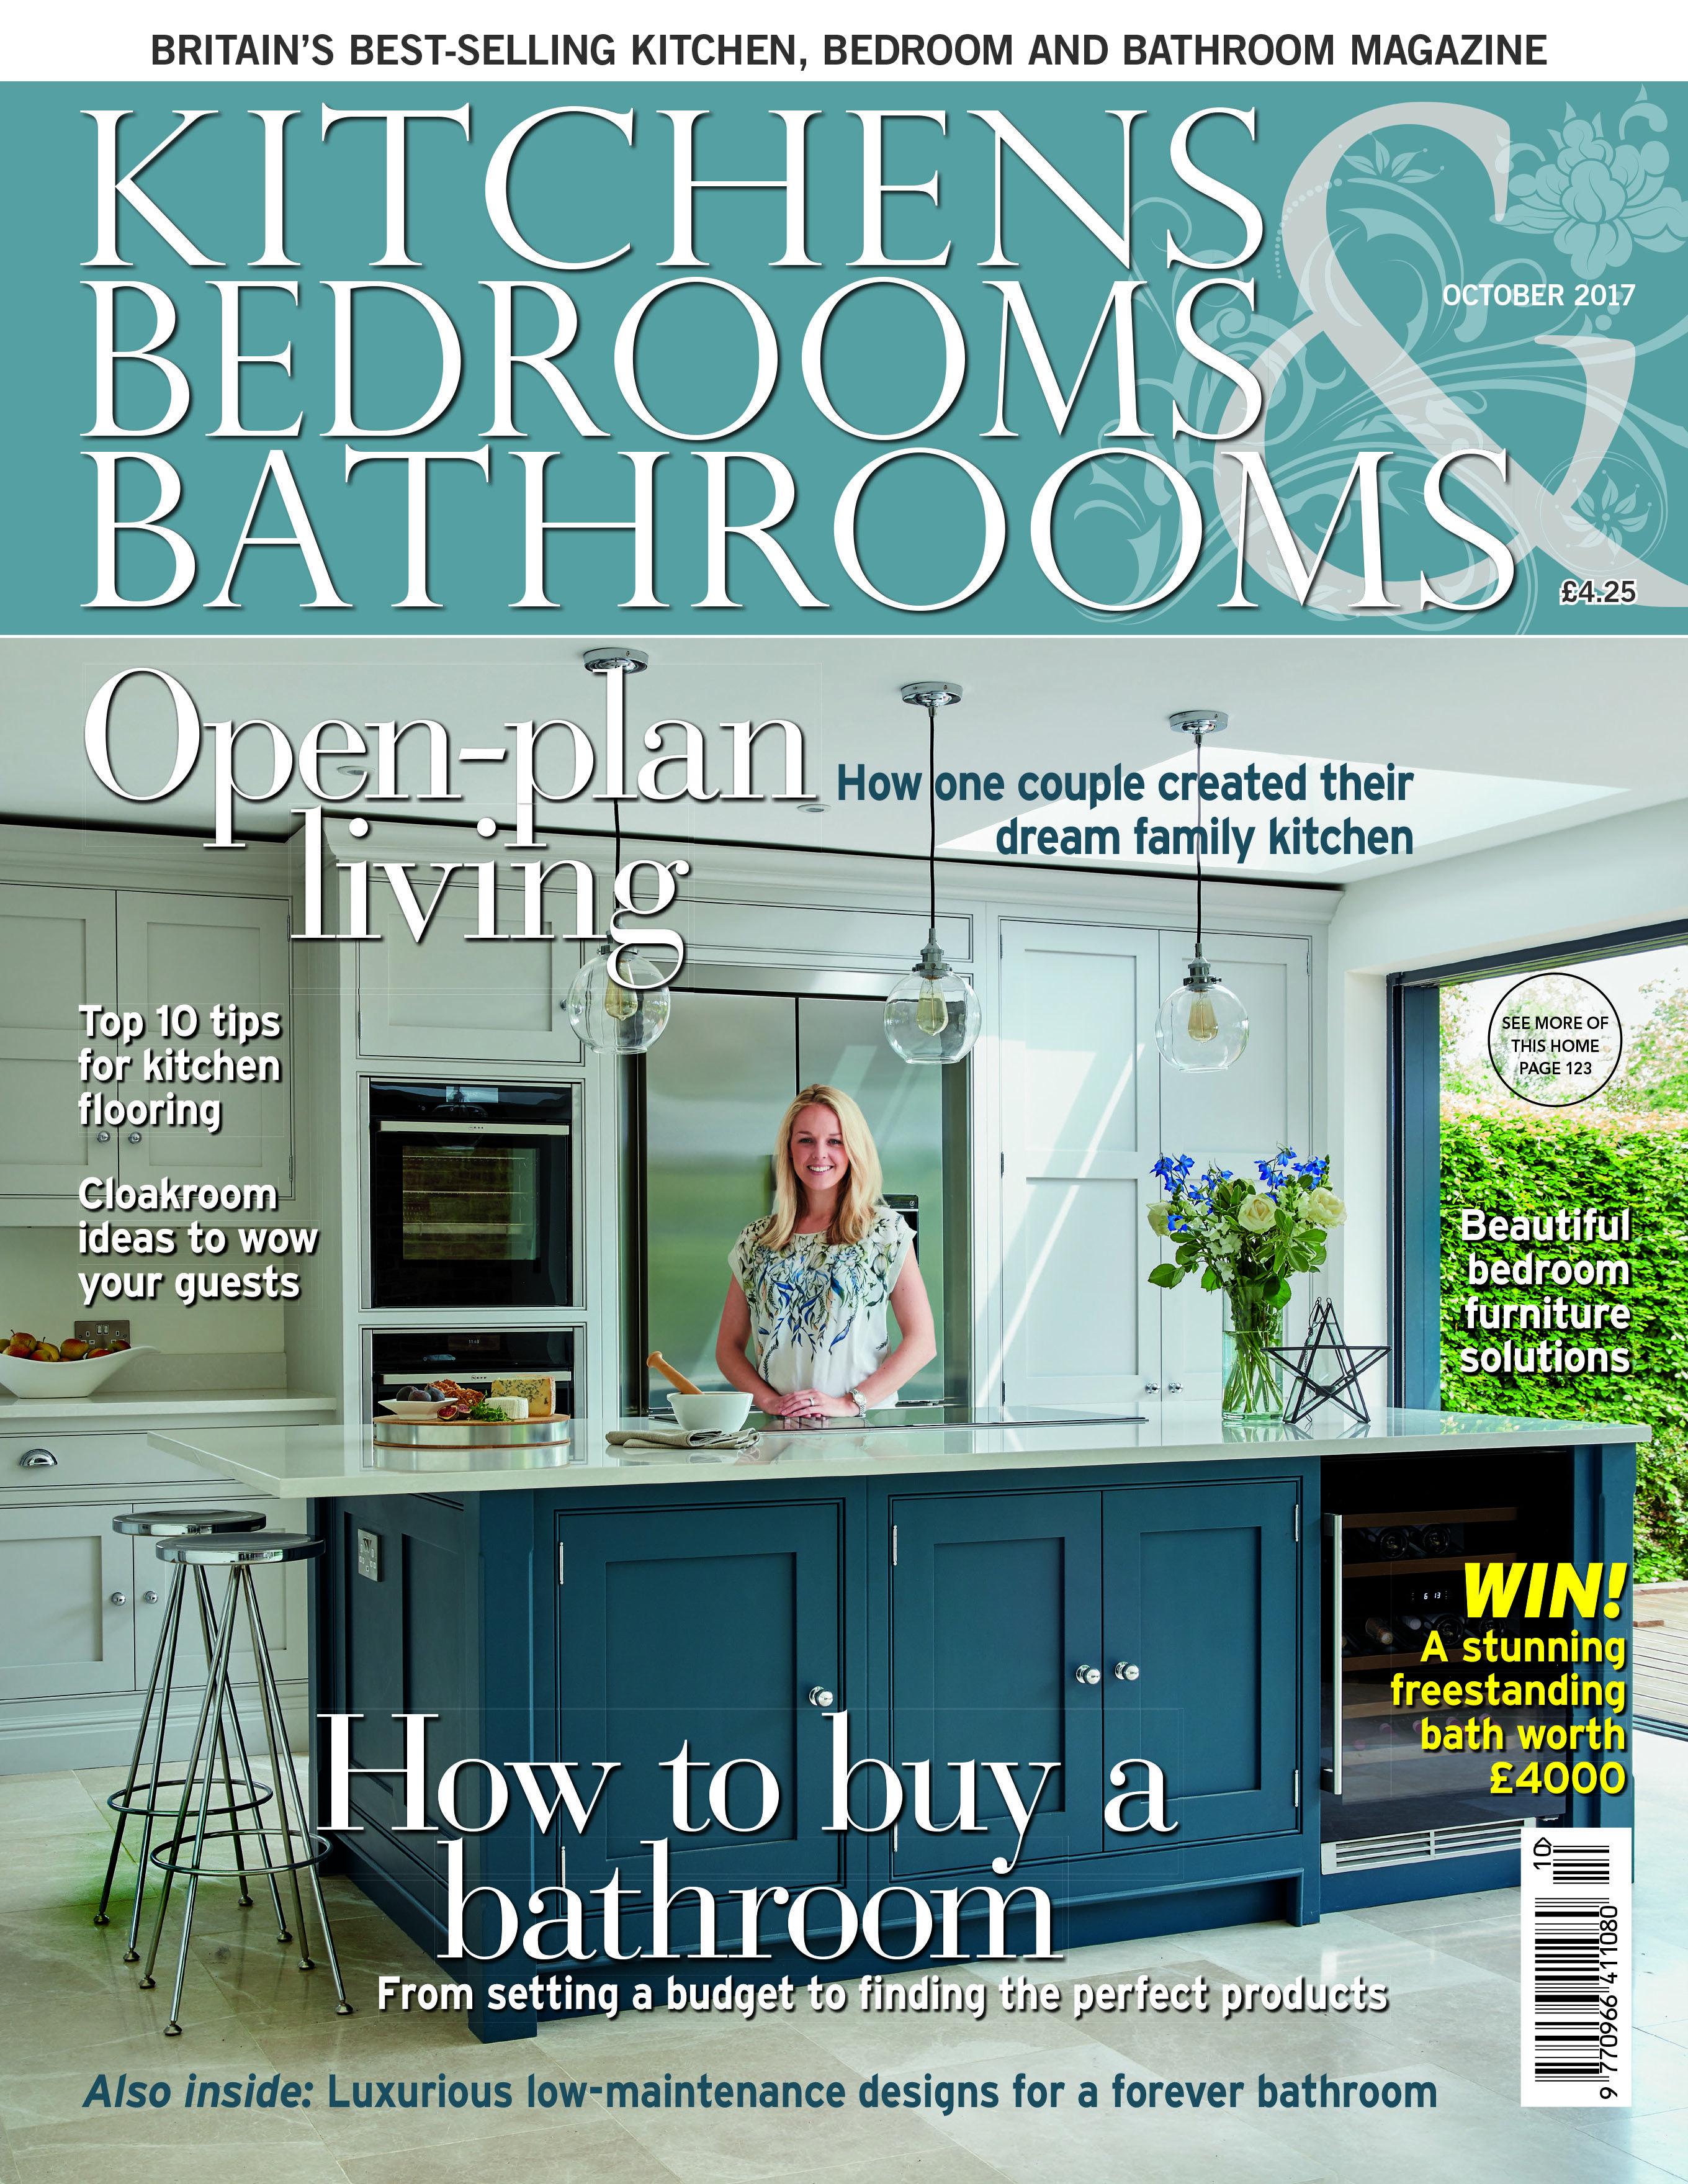 Images Photos Kitchens Bedrooms u Bathrooms magazine October